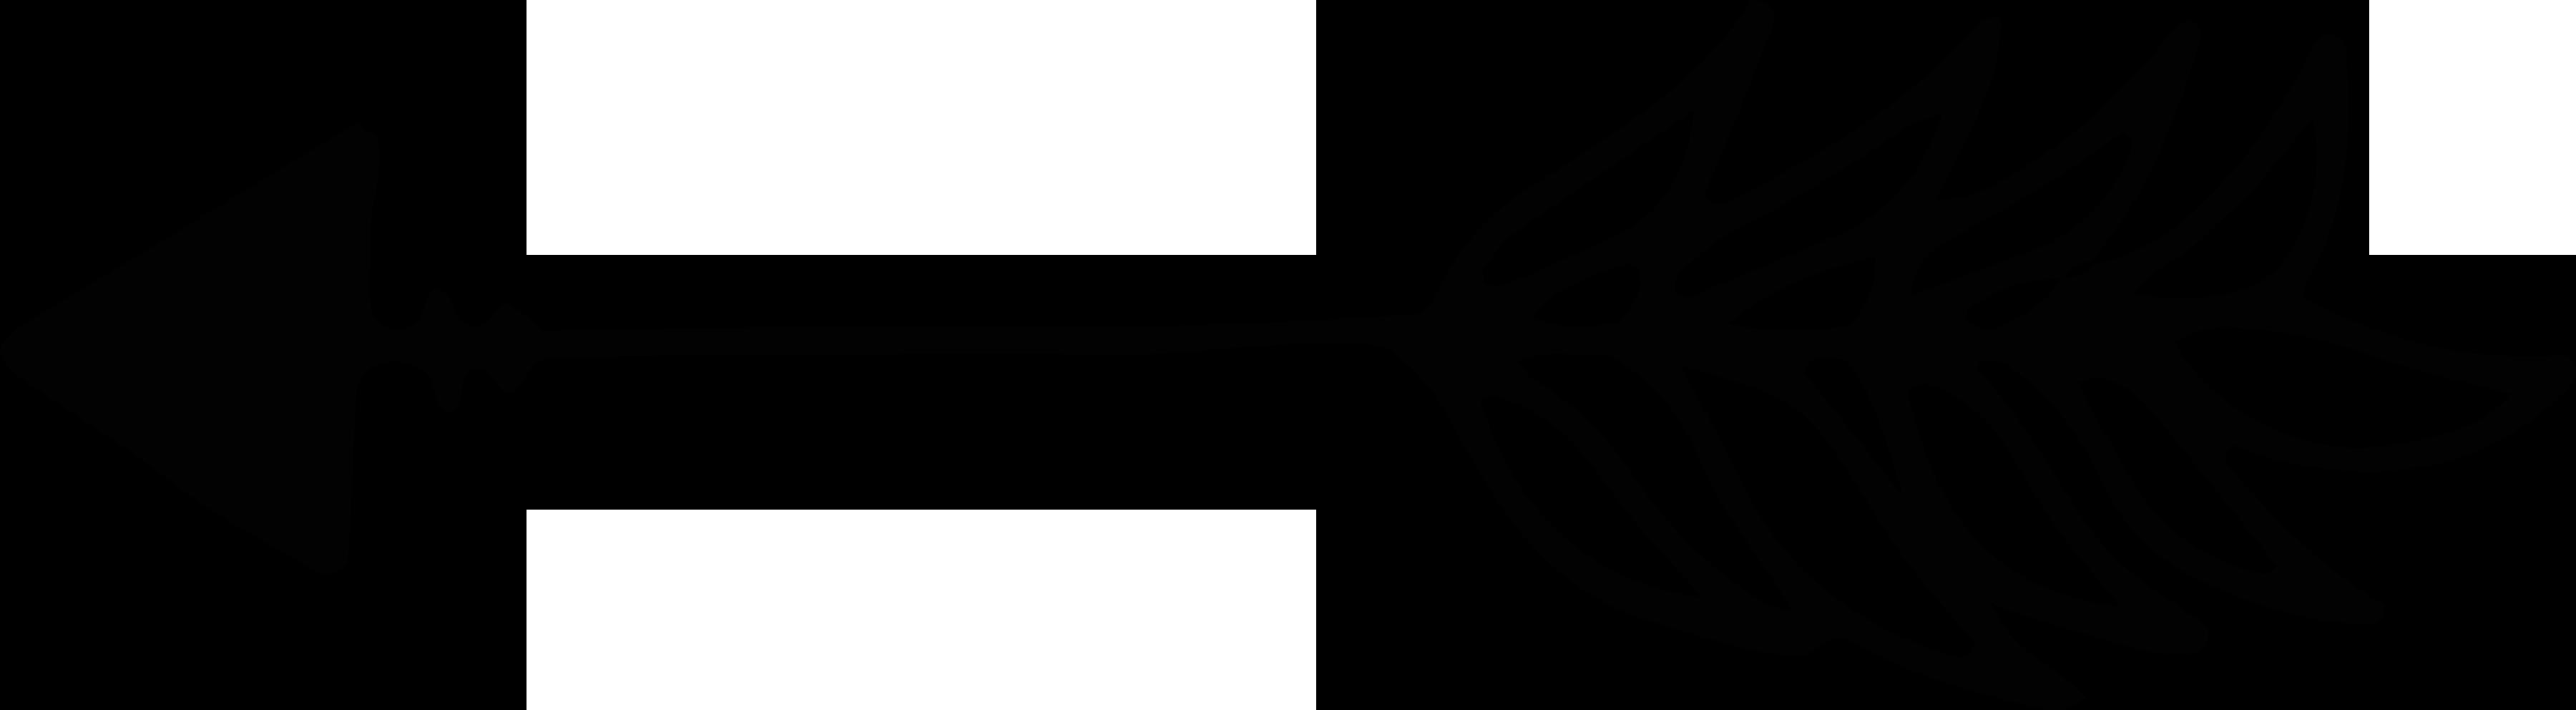 Arrow FPTFY 5 3781x766